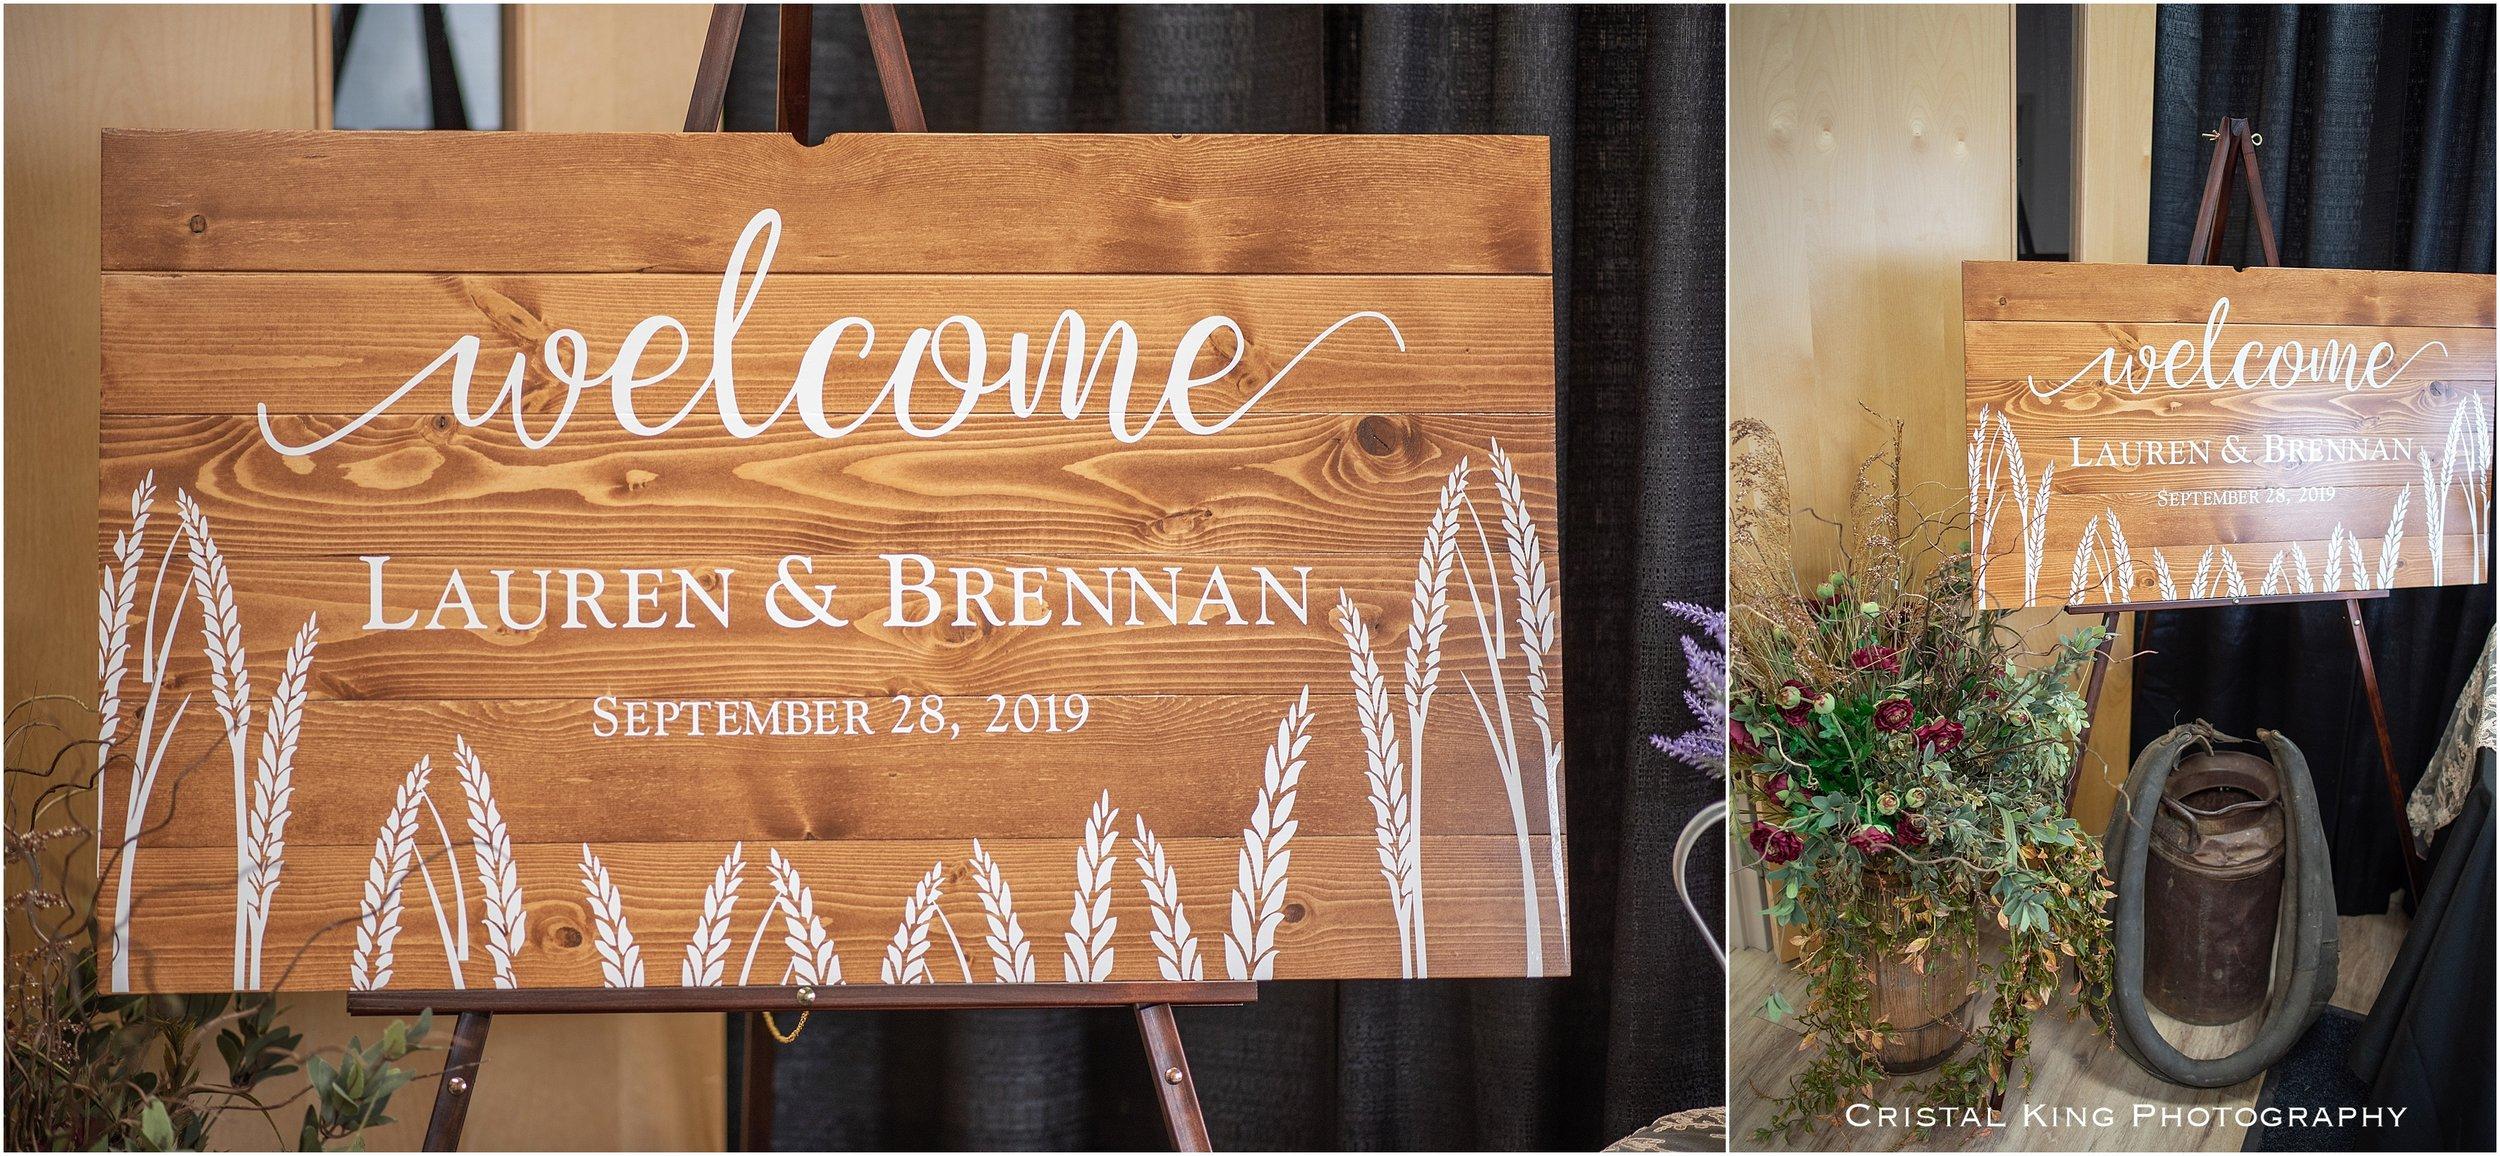 Lauren & Brennan's Wedding-57.jpg